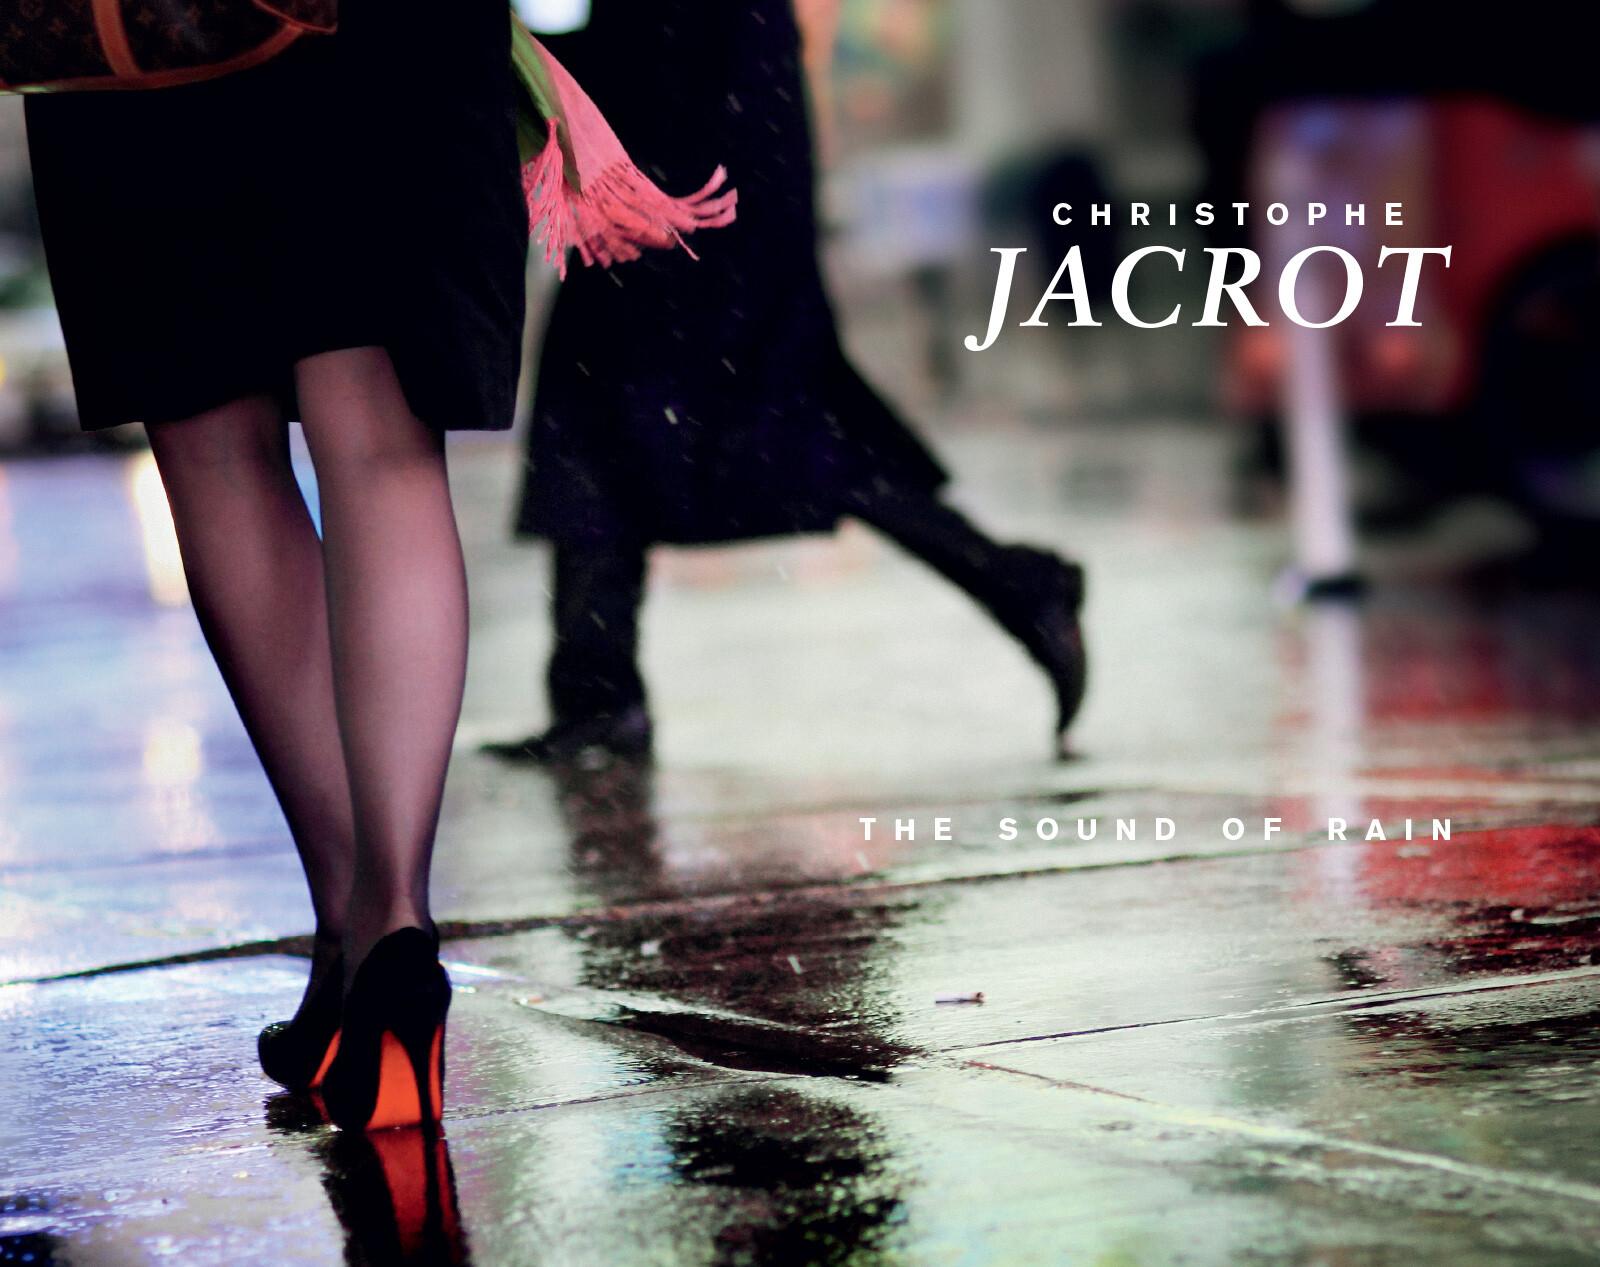 ARTIST BOOK - The Sound of Rain - Christophe Jacrot